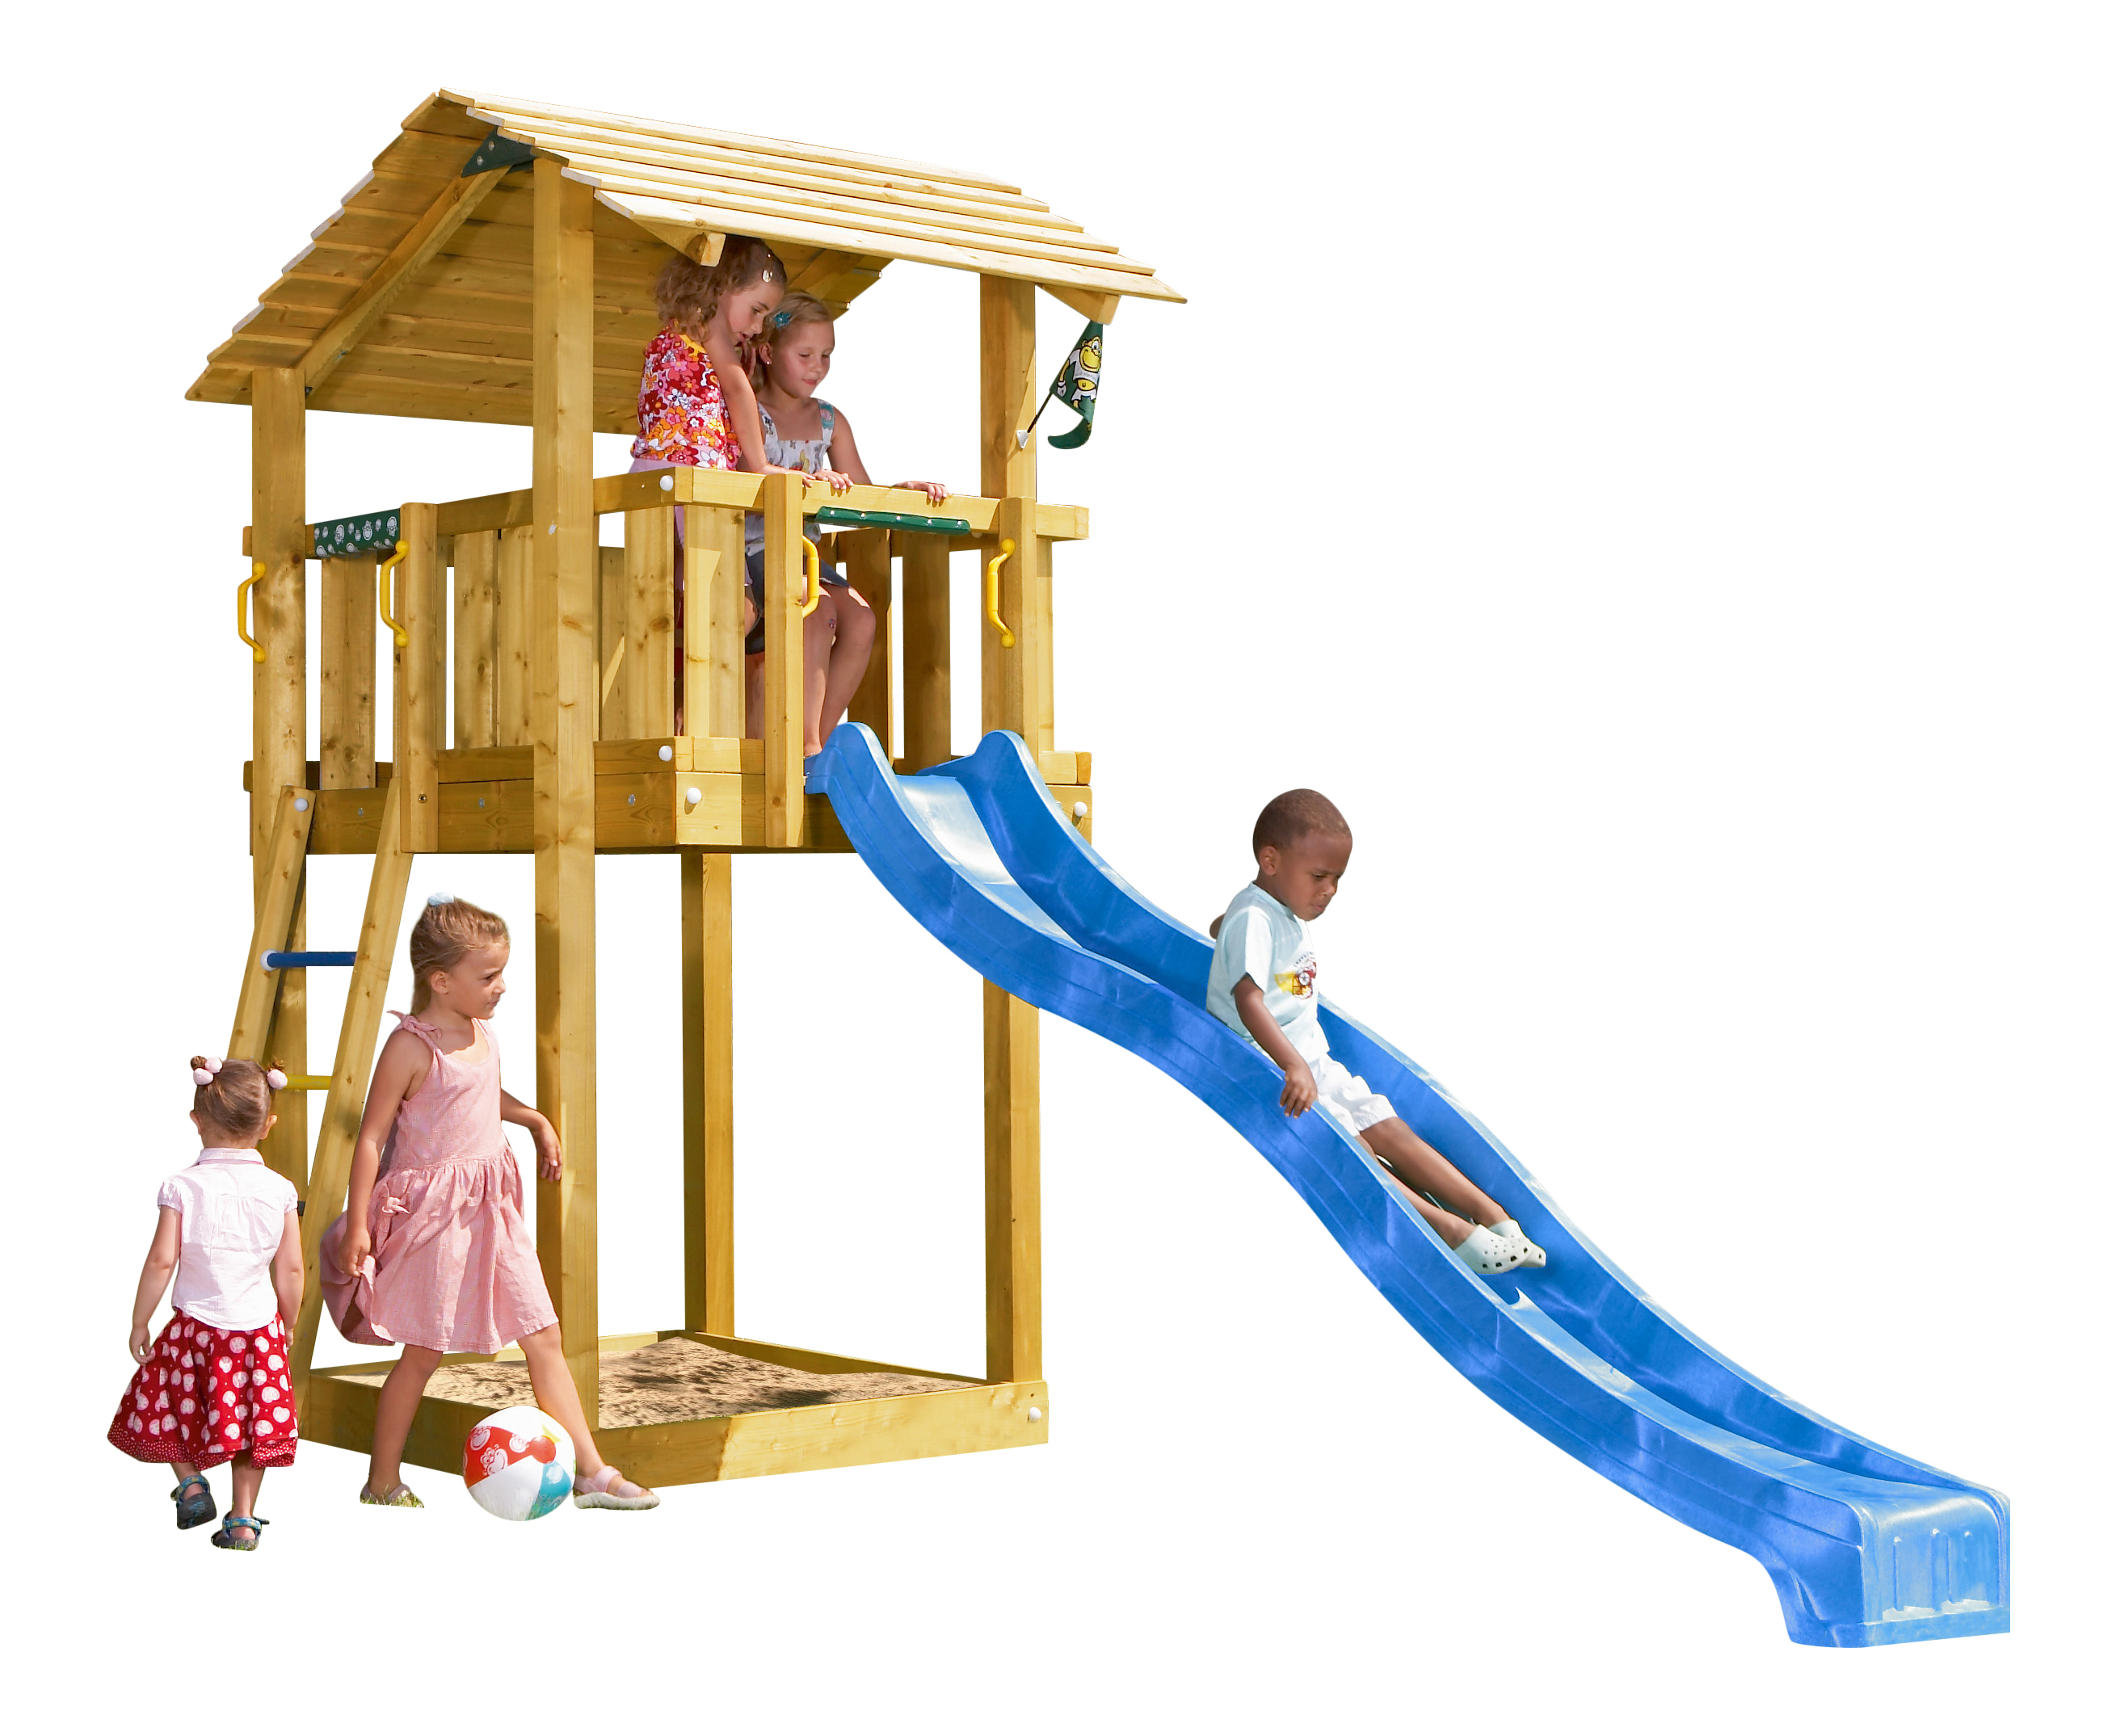 jungle gym spielturm shelter kletterturm mit rutsche holz. Black Bedroom Furniture Sets. Home Design Ideas